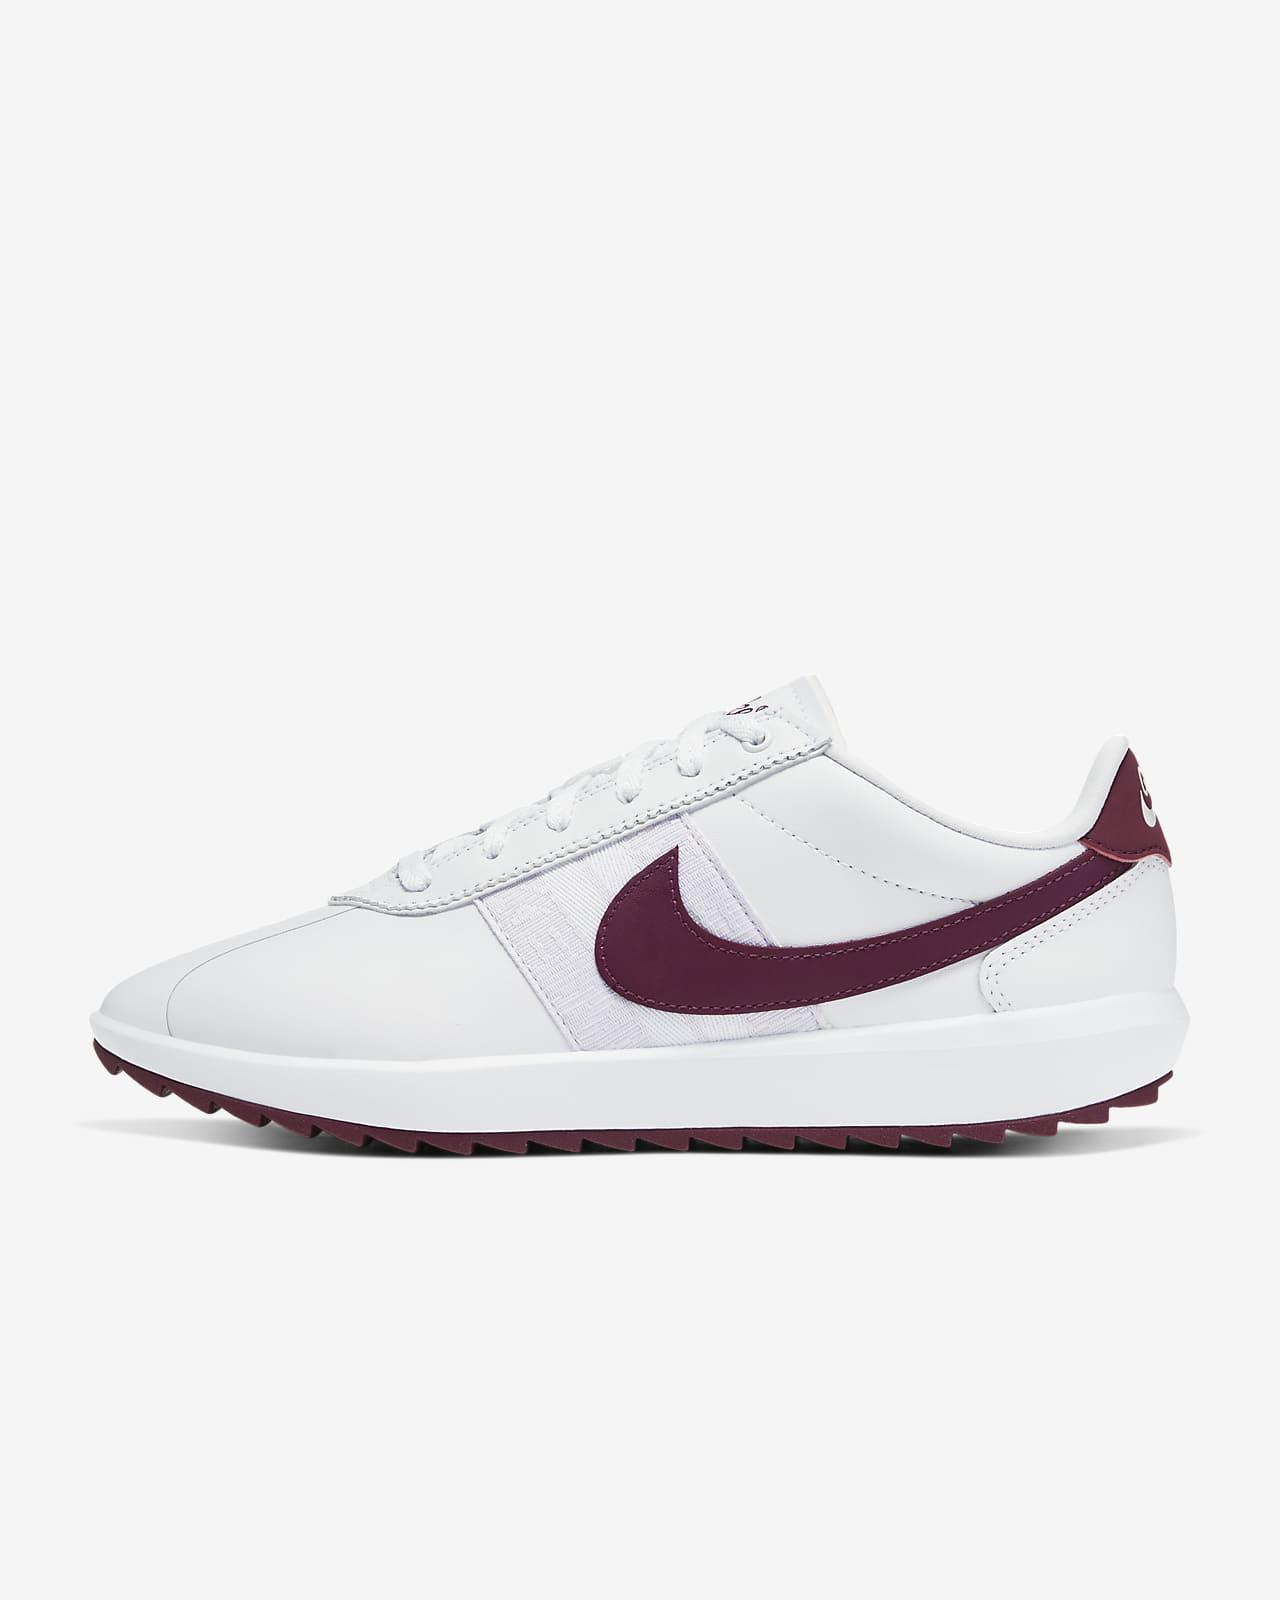 difícil parcialidad coro  Nike Cortez G Women's Golf Shoe. Nike LU